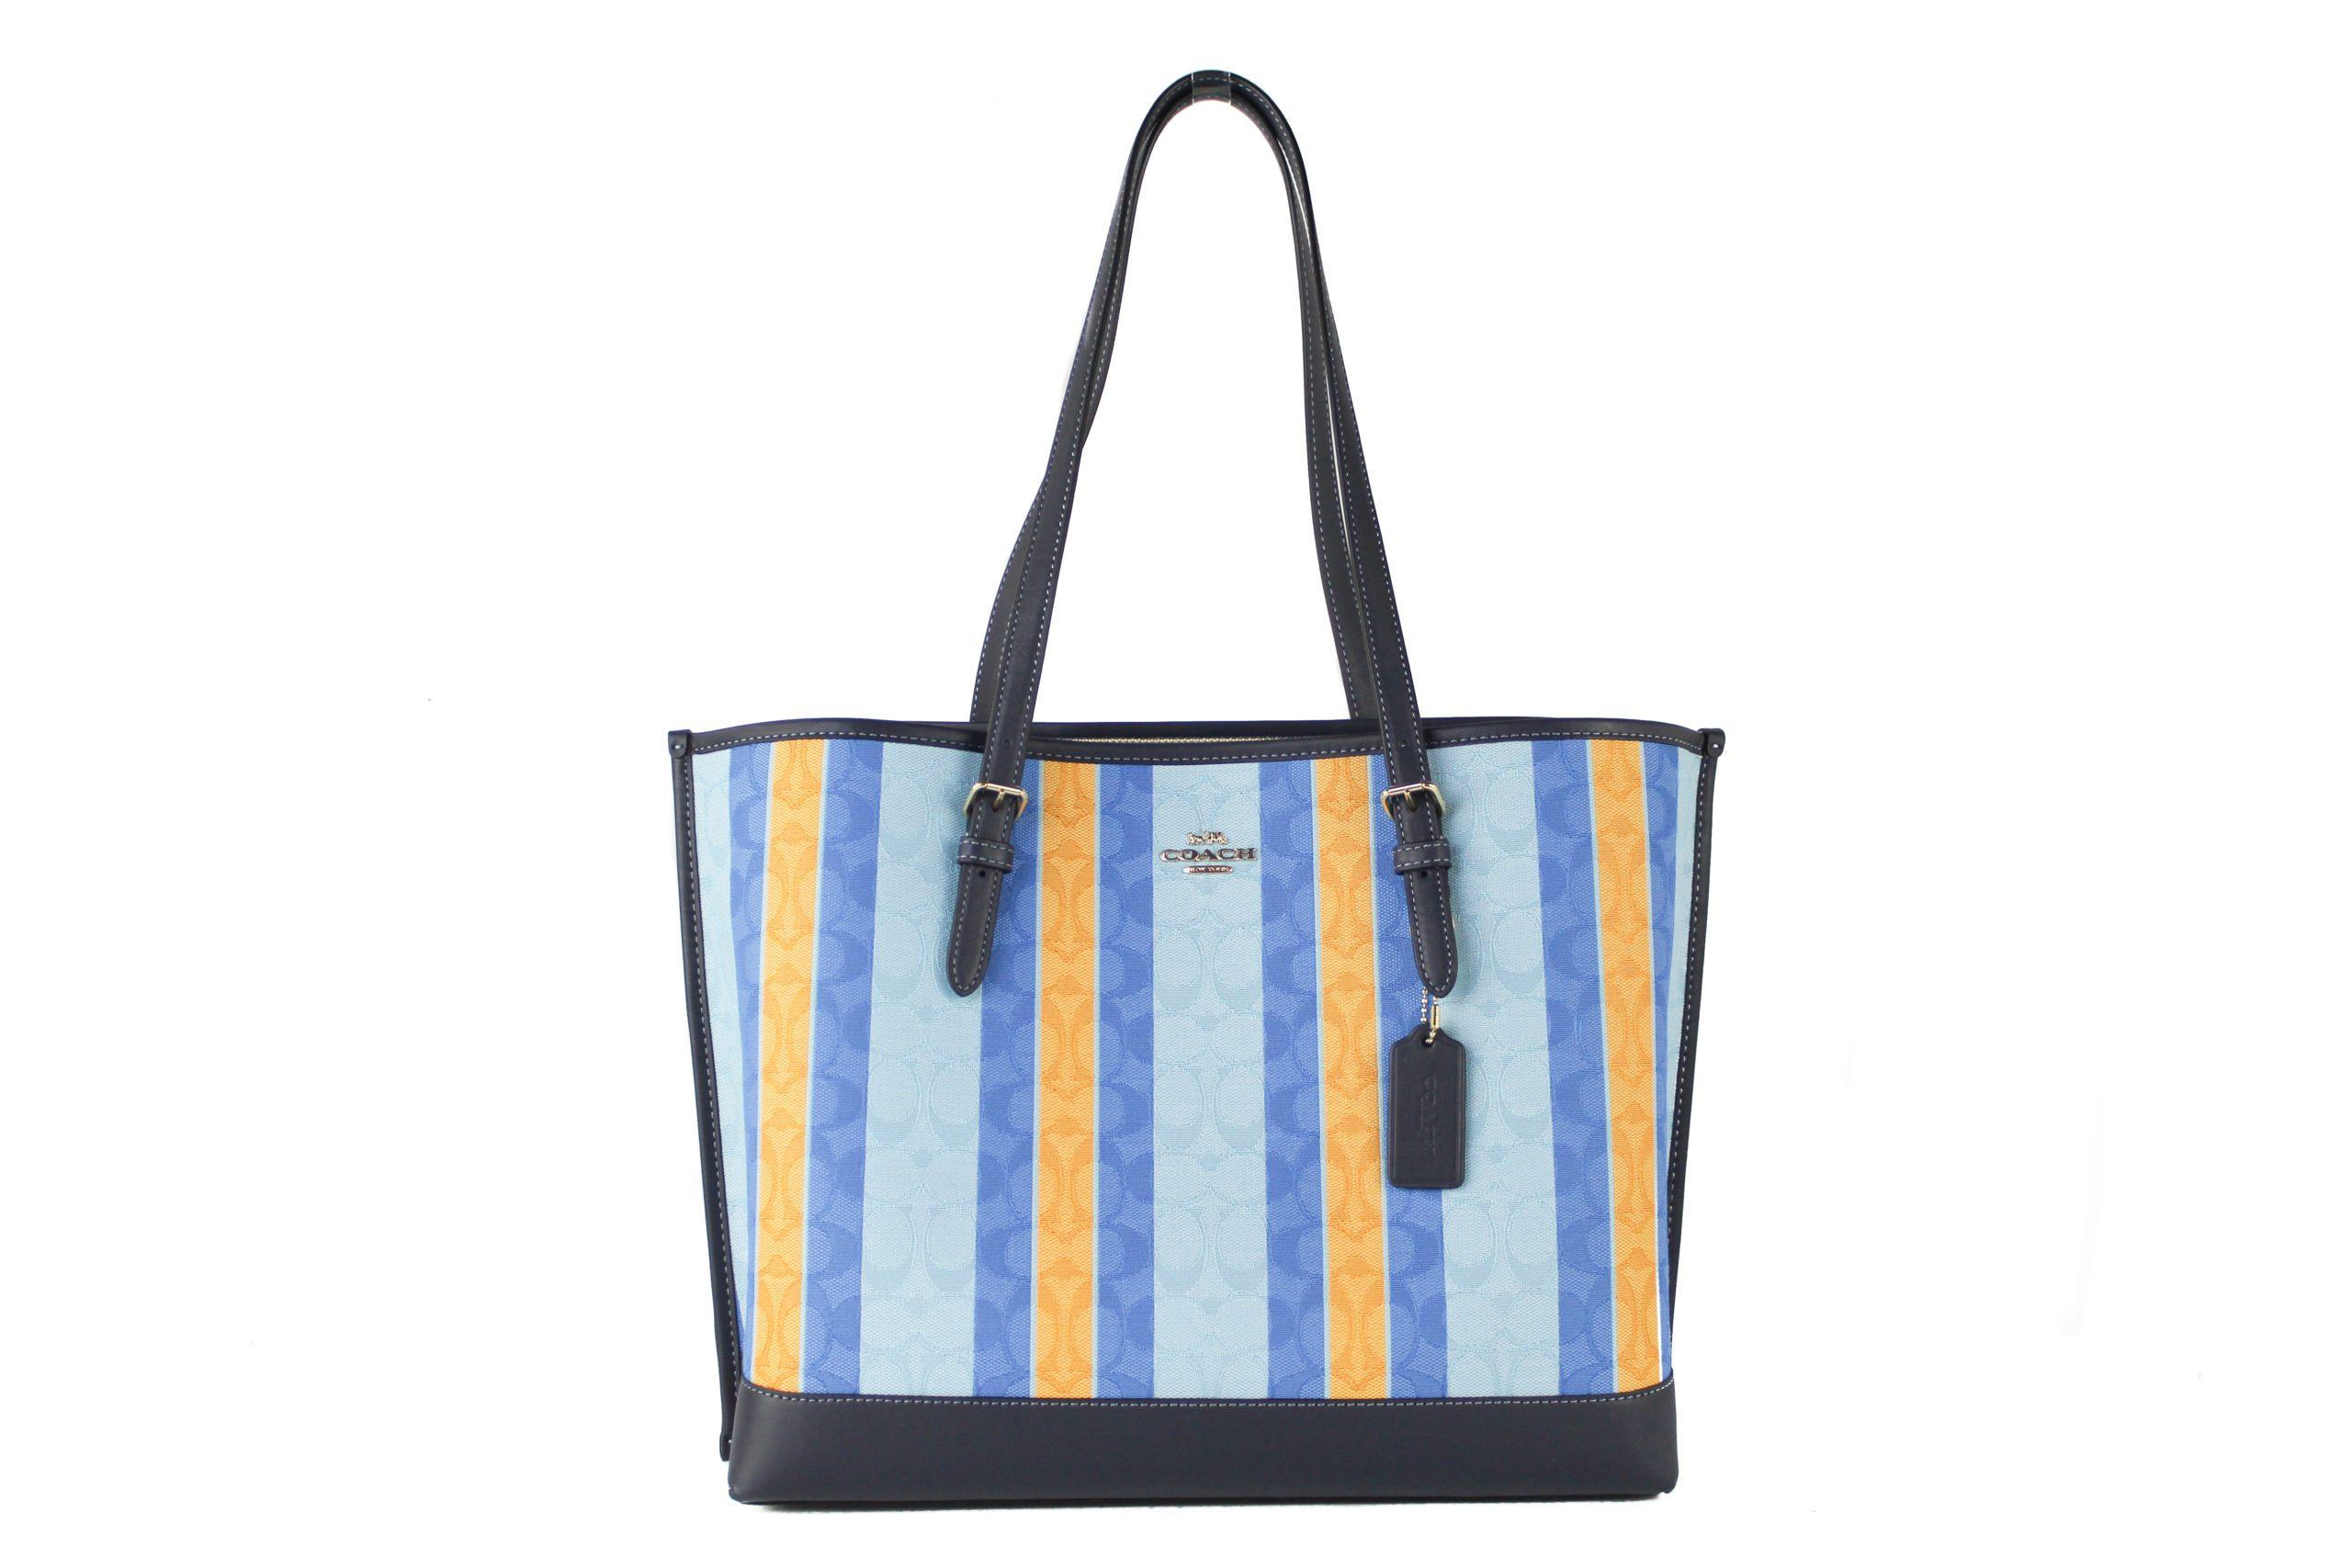 COACH Women's Jacquard Tote Bag Blue 265853